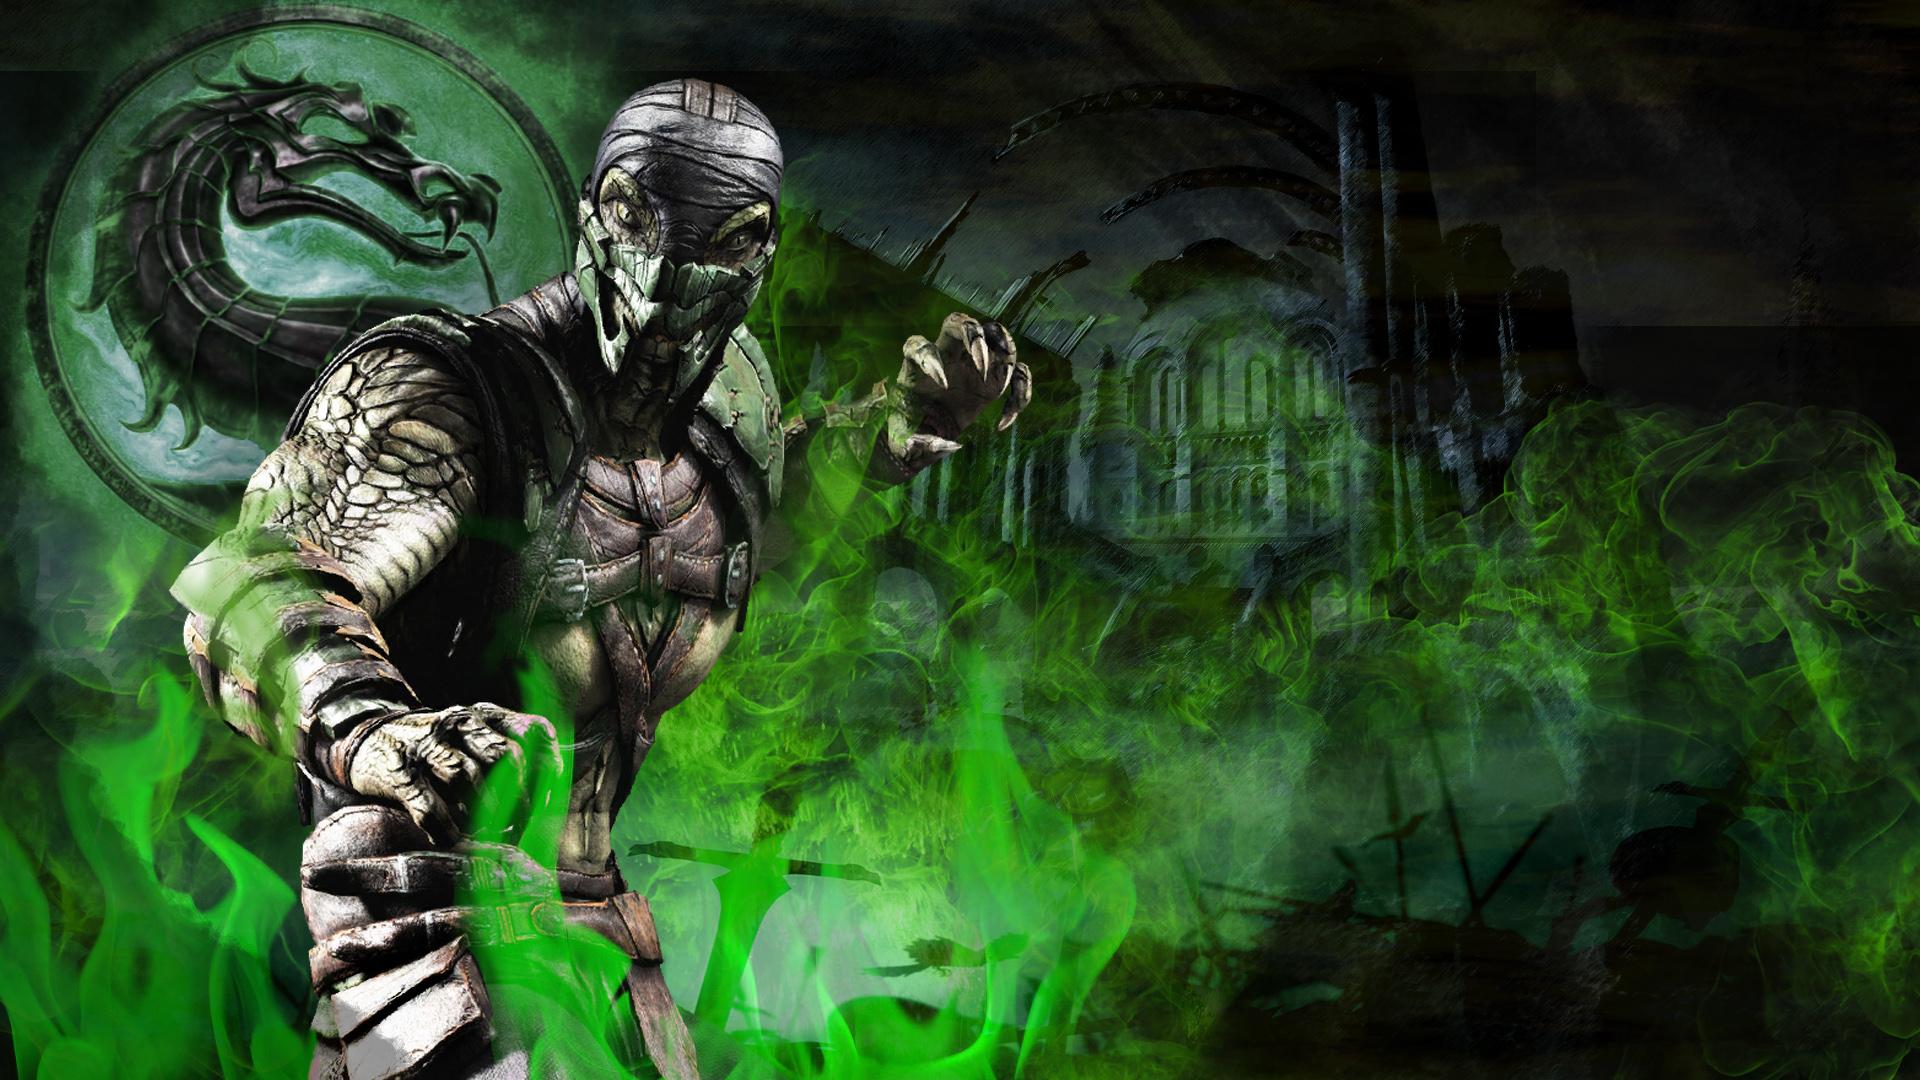 Mortal Kombat Hd 1080 X 1920 Wallpaper By Solywack On Deviantart